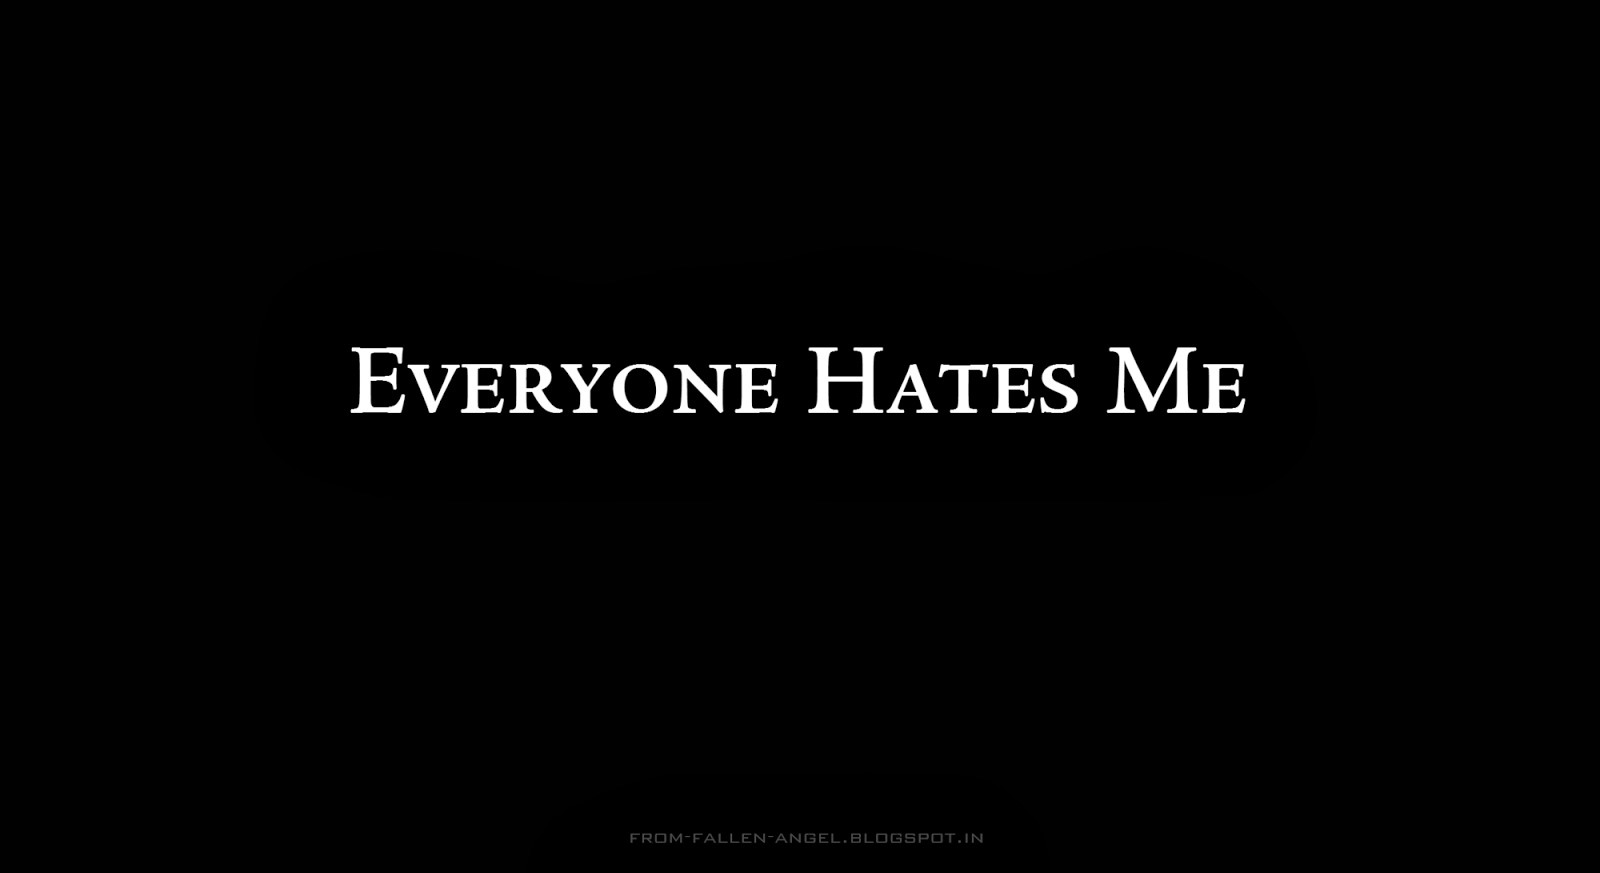 Everyone hates me